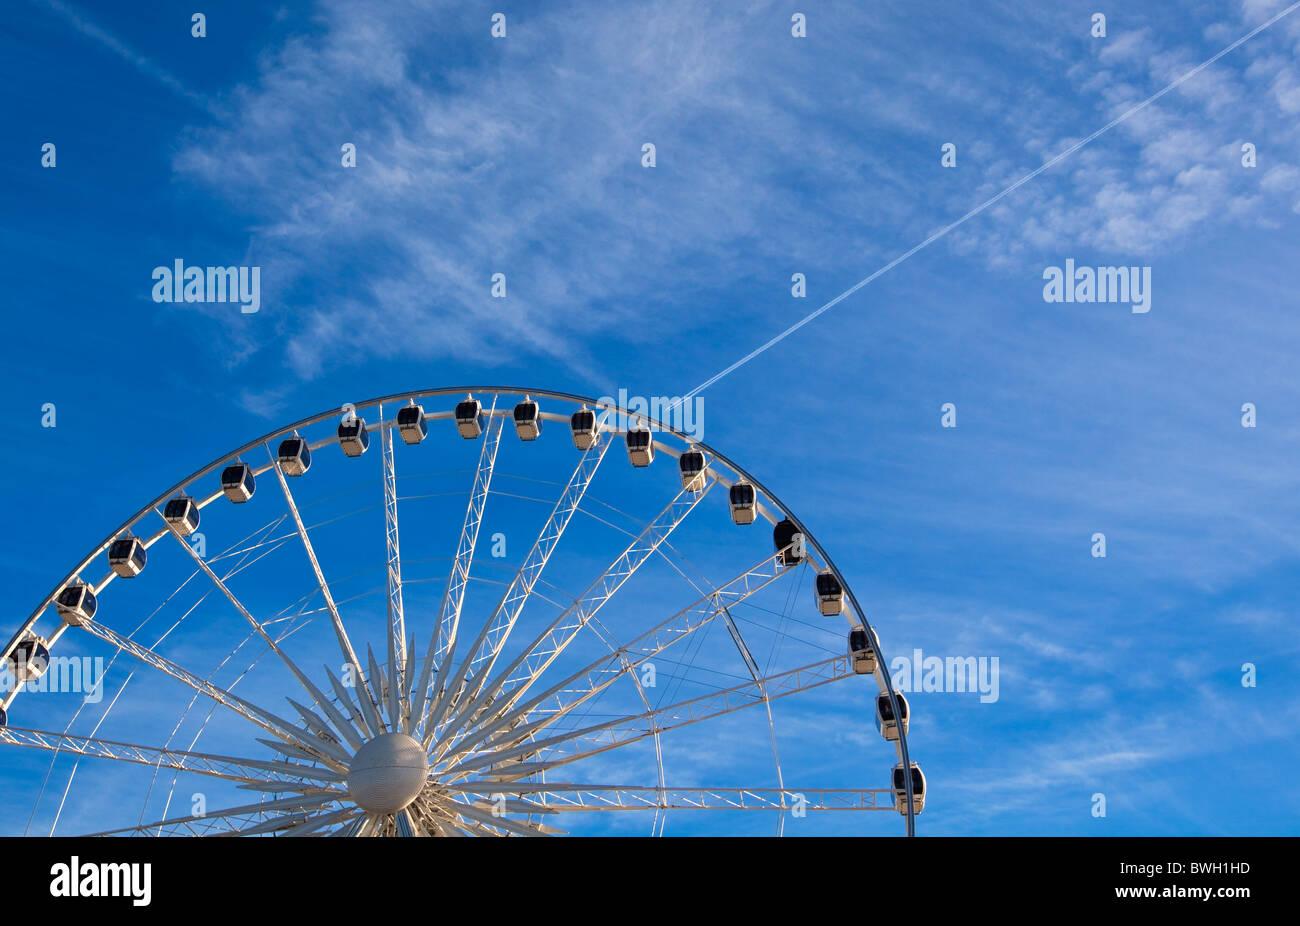 big ferris wheel on blue sky background. horizontal shot - Stock Image